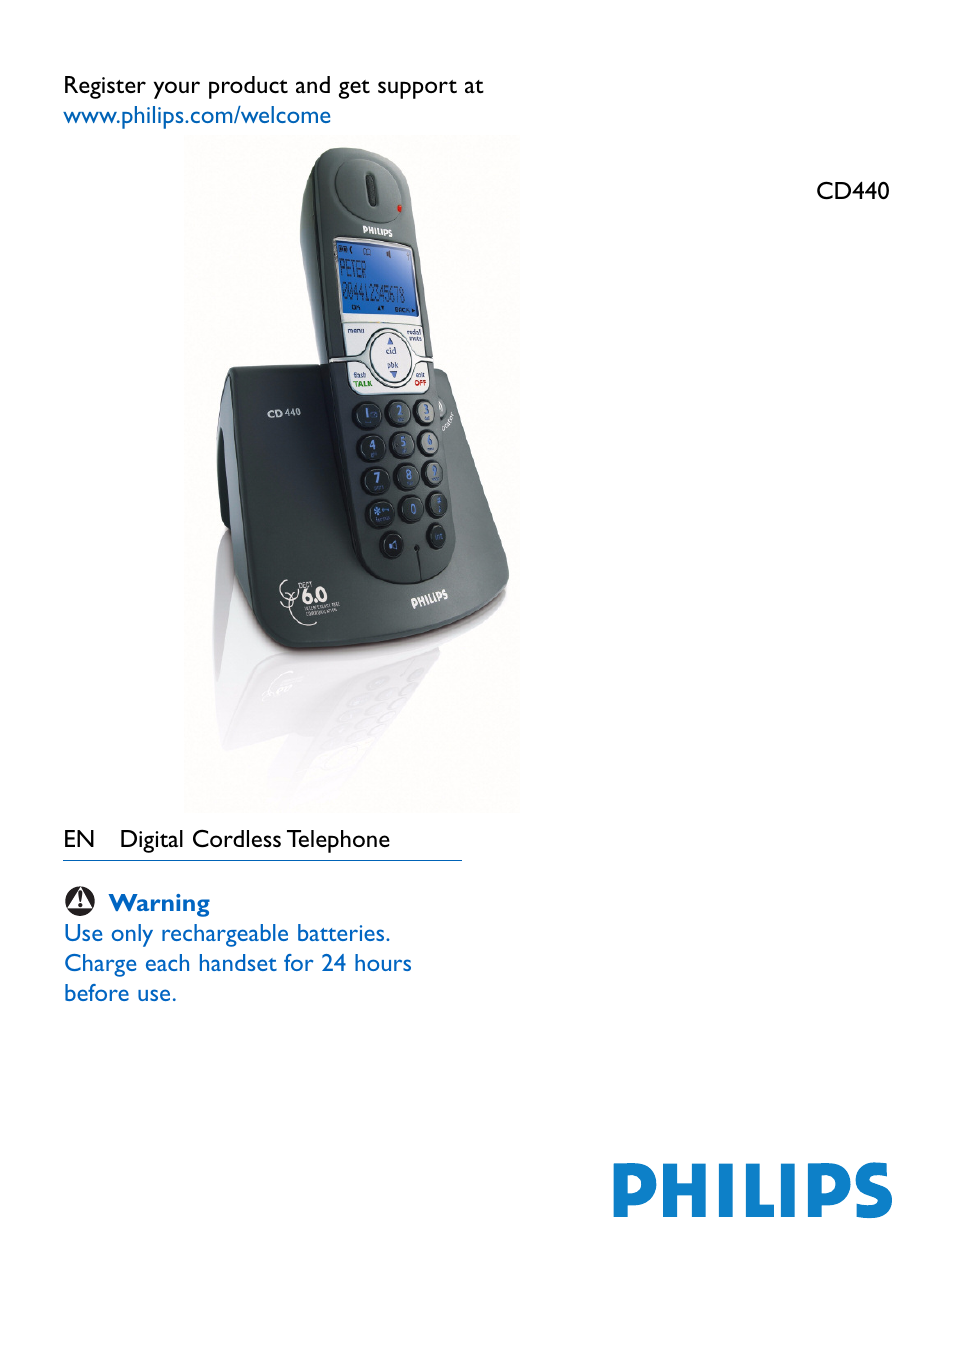 Philips Cordless Phone Manual Various Owner Manual Guide